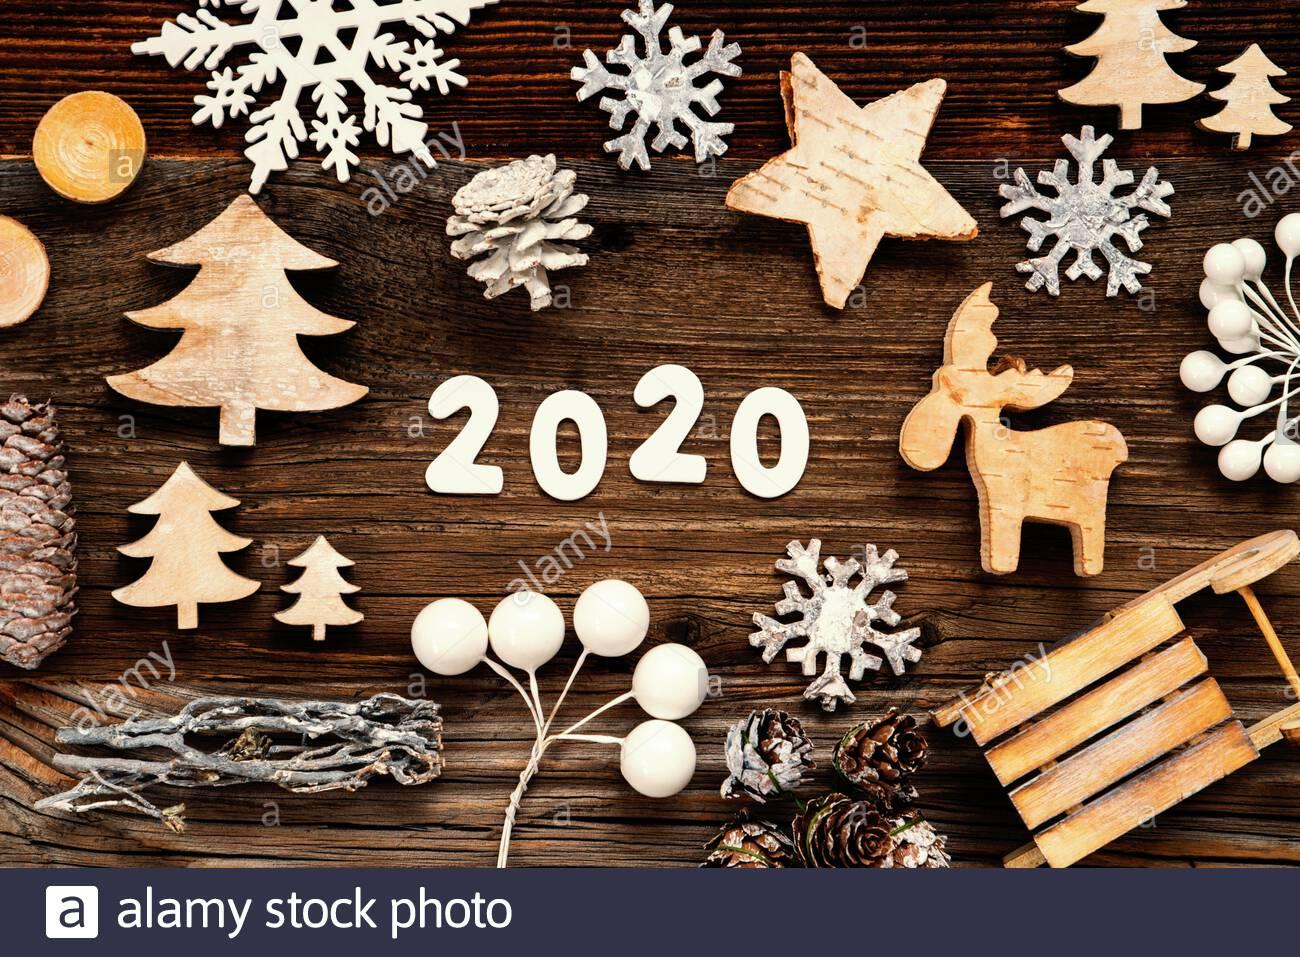 Building Christmas Decorations 2020 Letters Building The Word 2020. Wooden Christmas Decoration Like